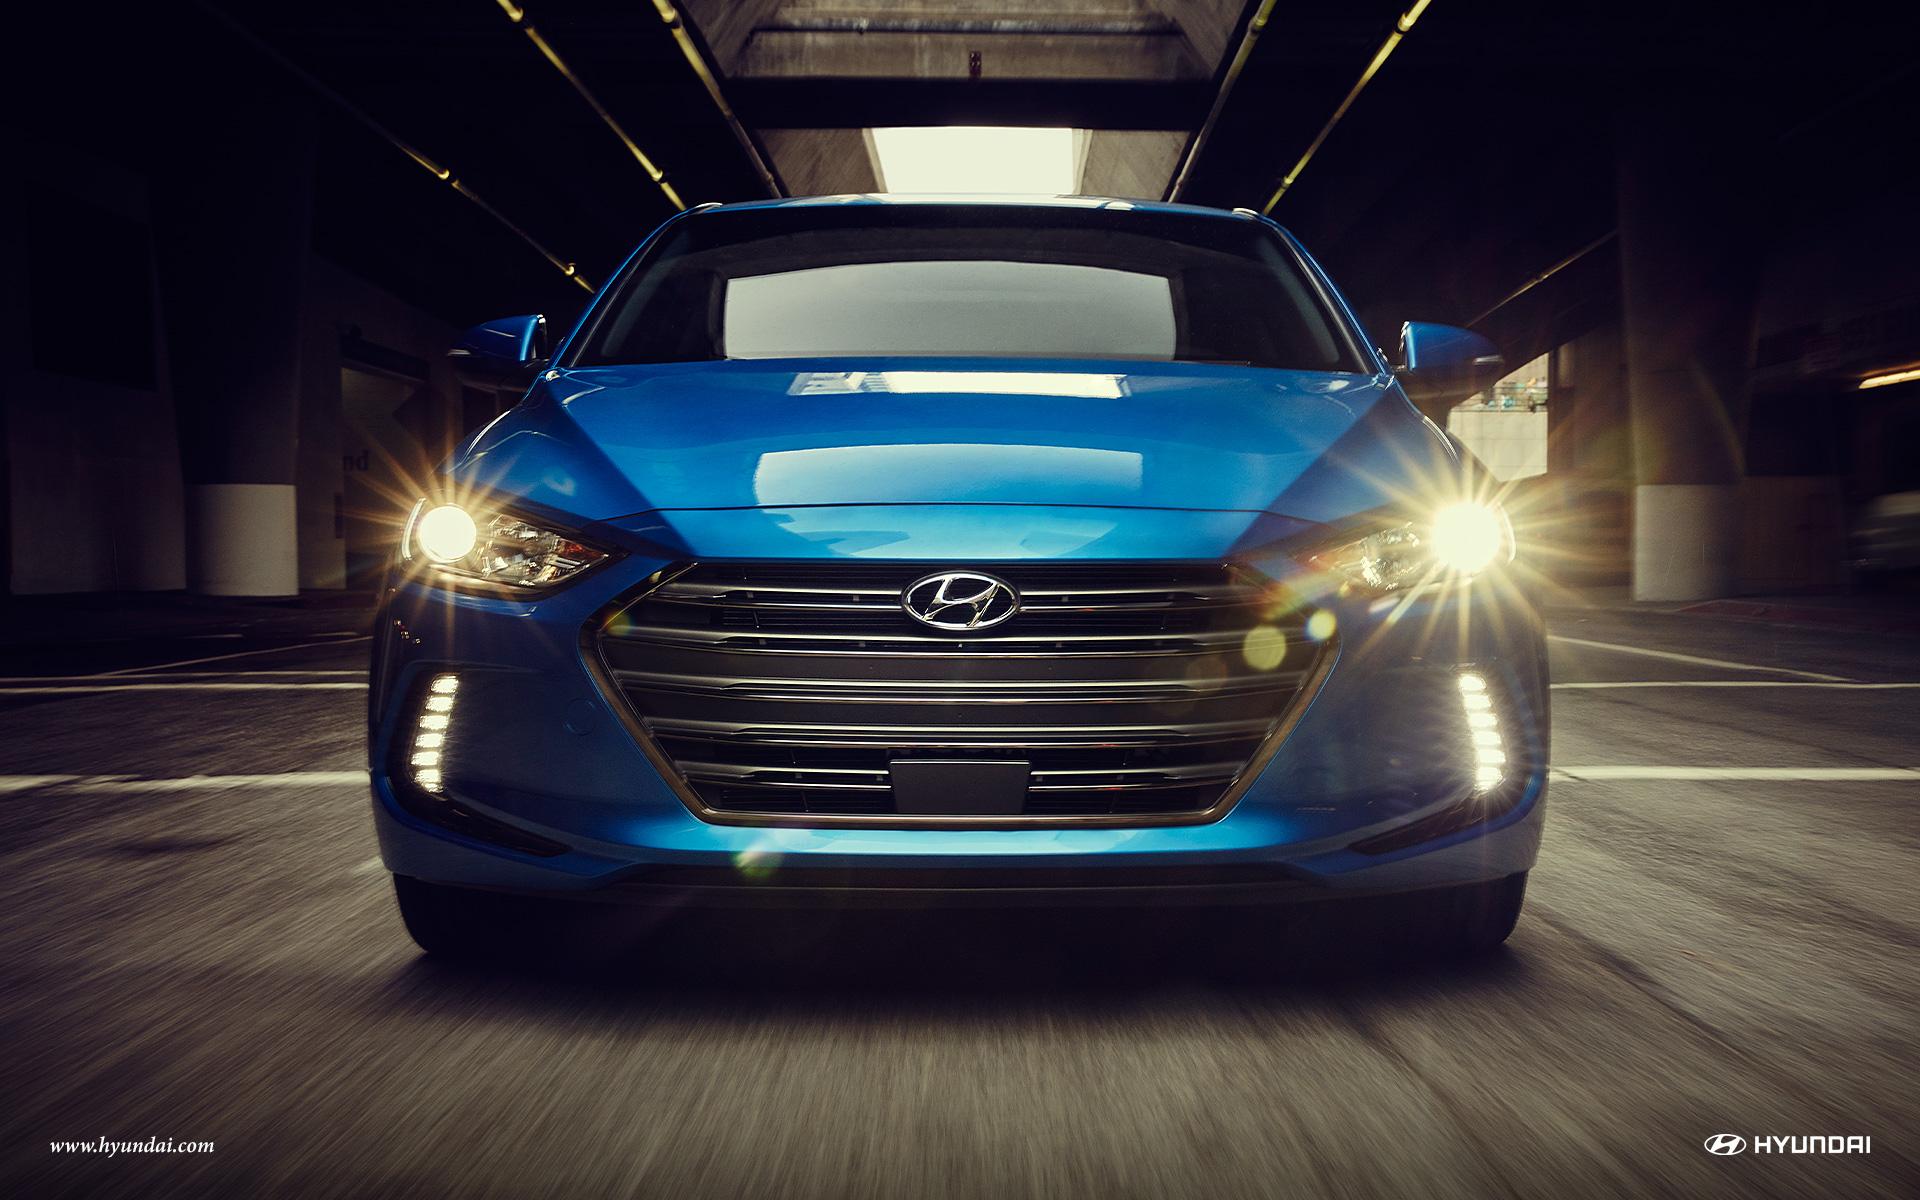 2017 Hyundai Elantra Front